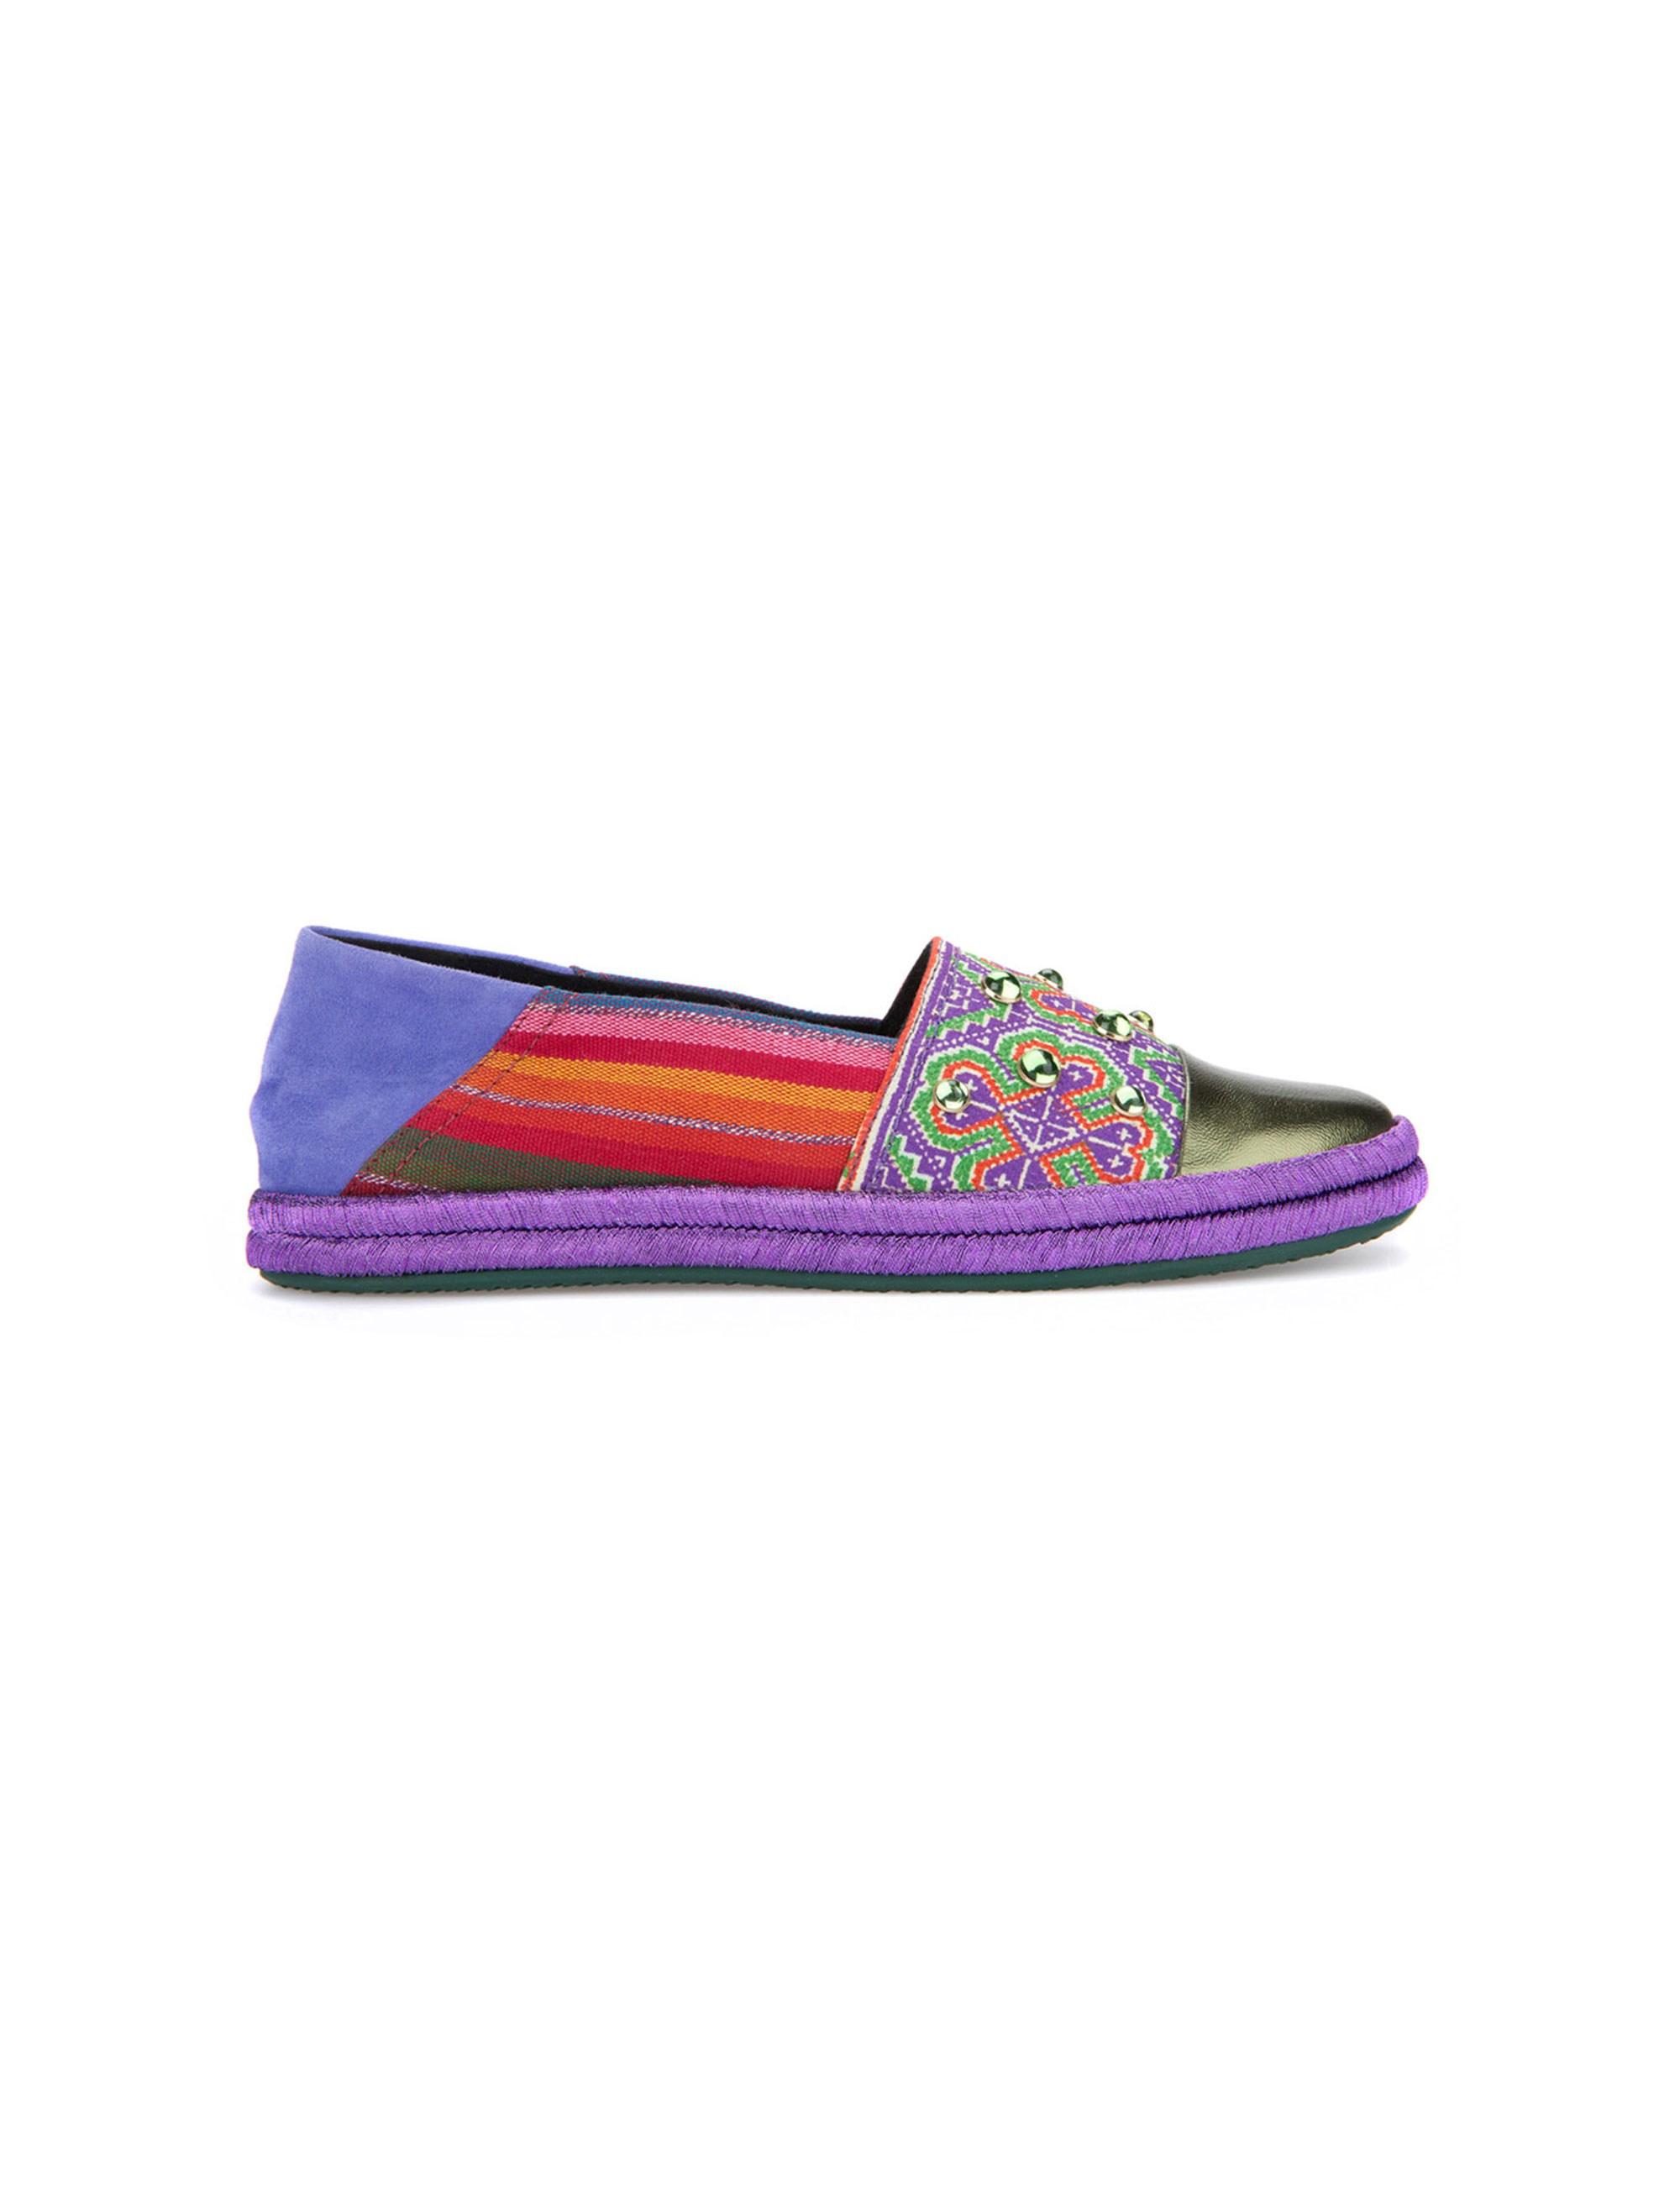 کفش تخت زنانه Modesty – جی اوکس